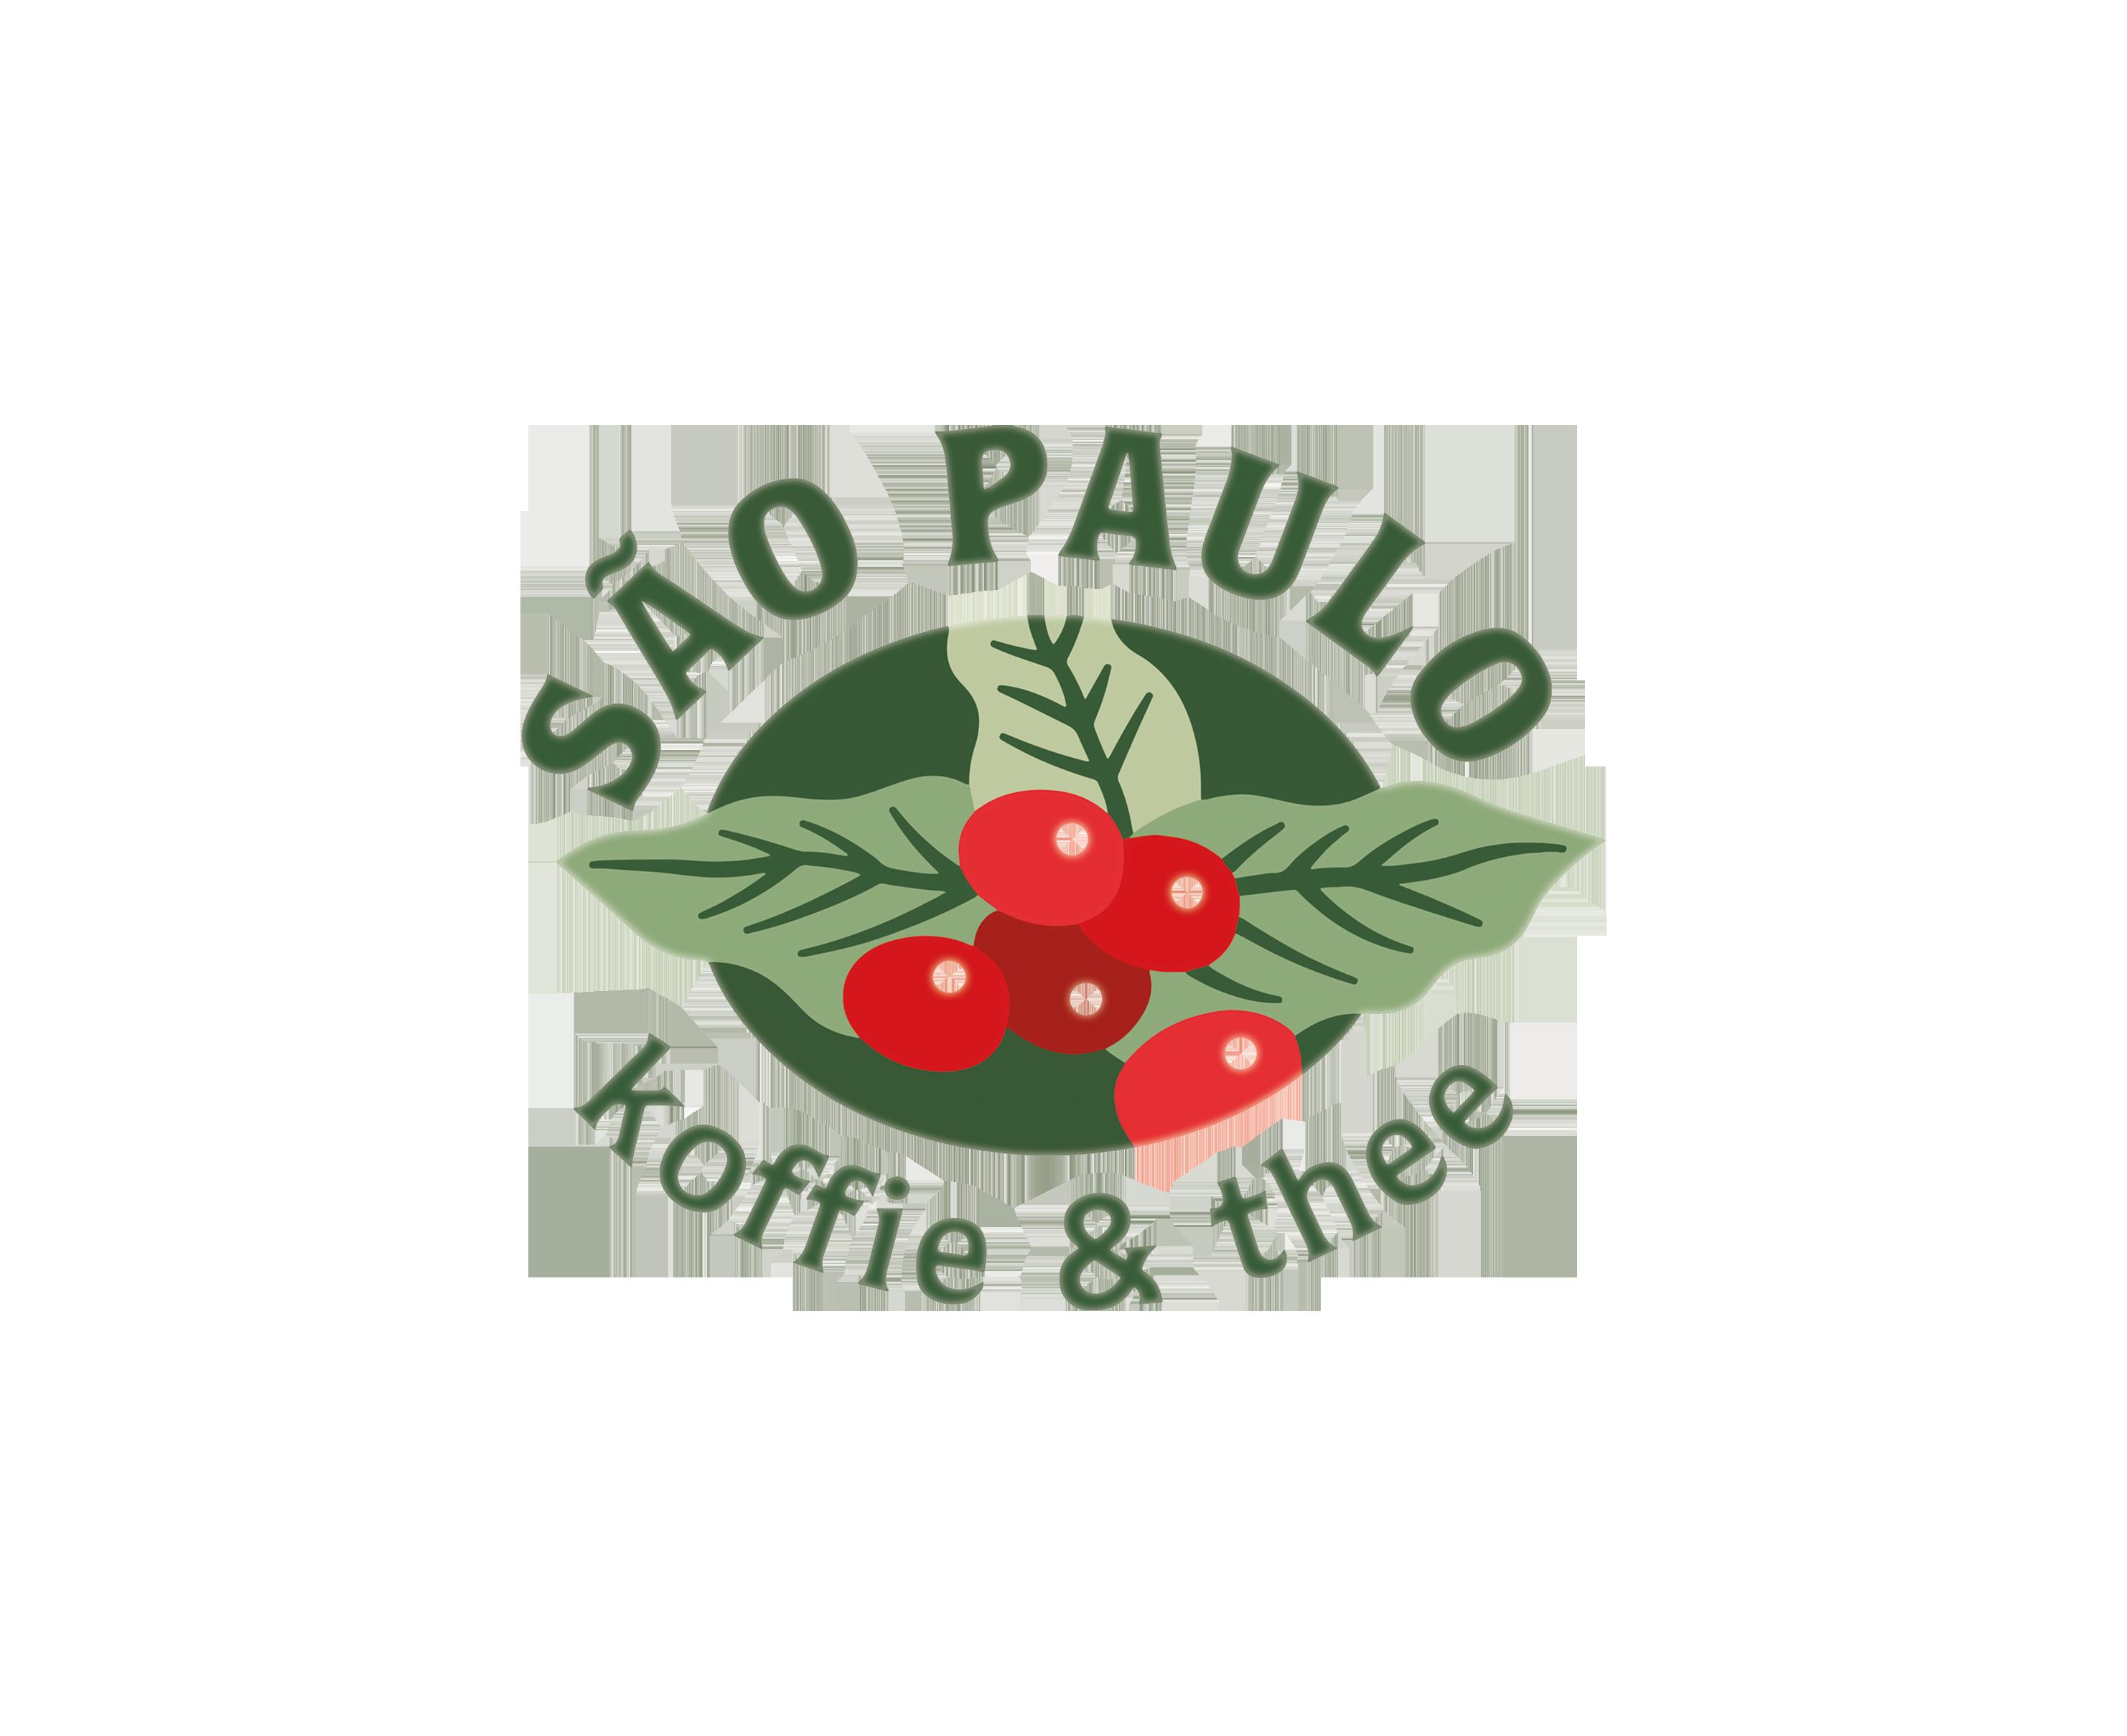 Koffiebranderij Sao Paulo